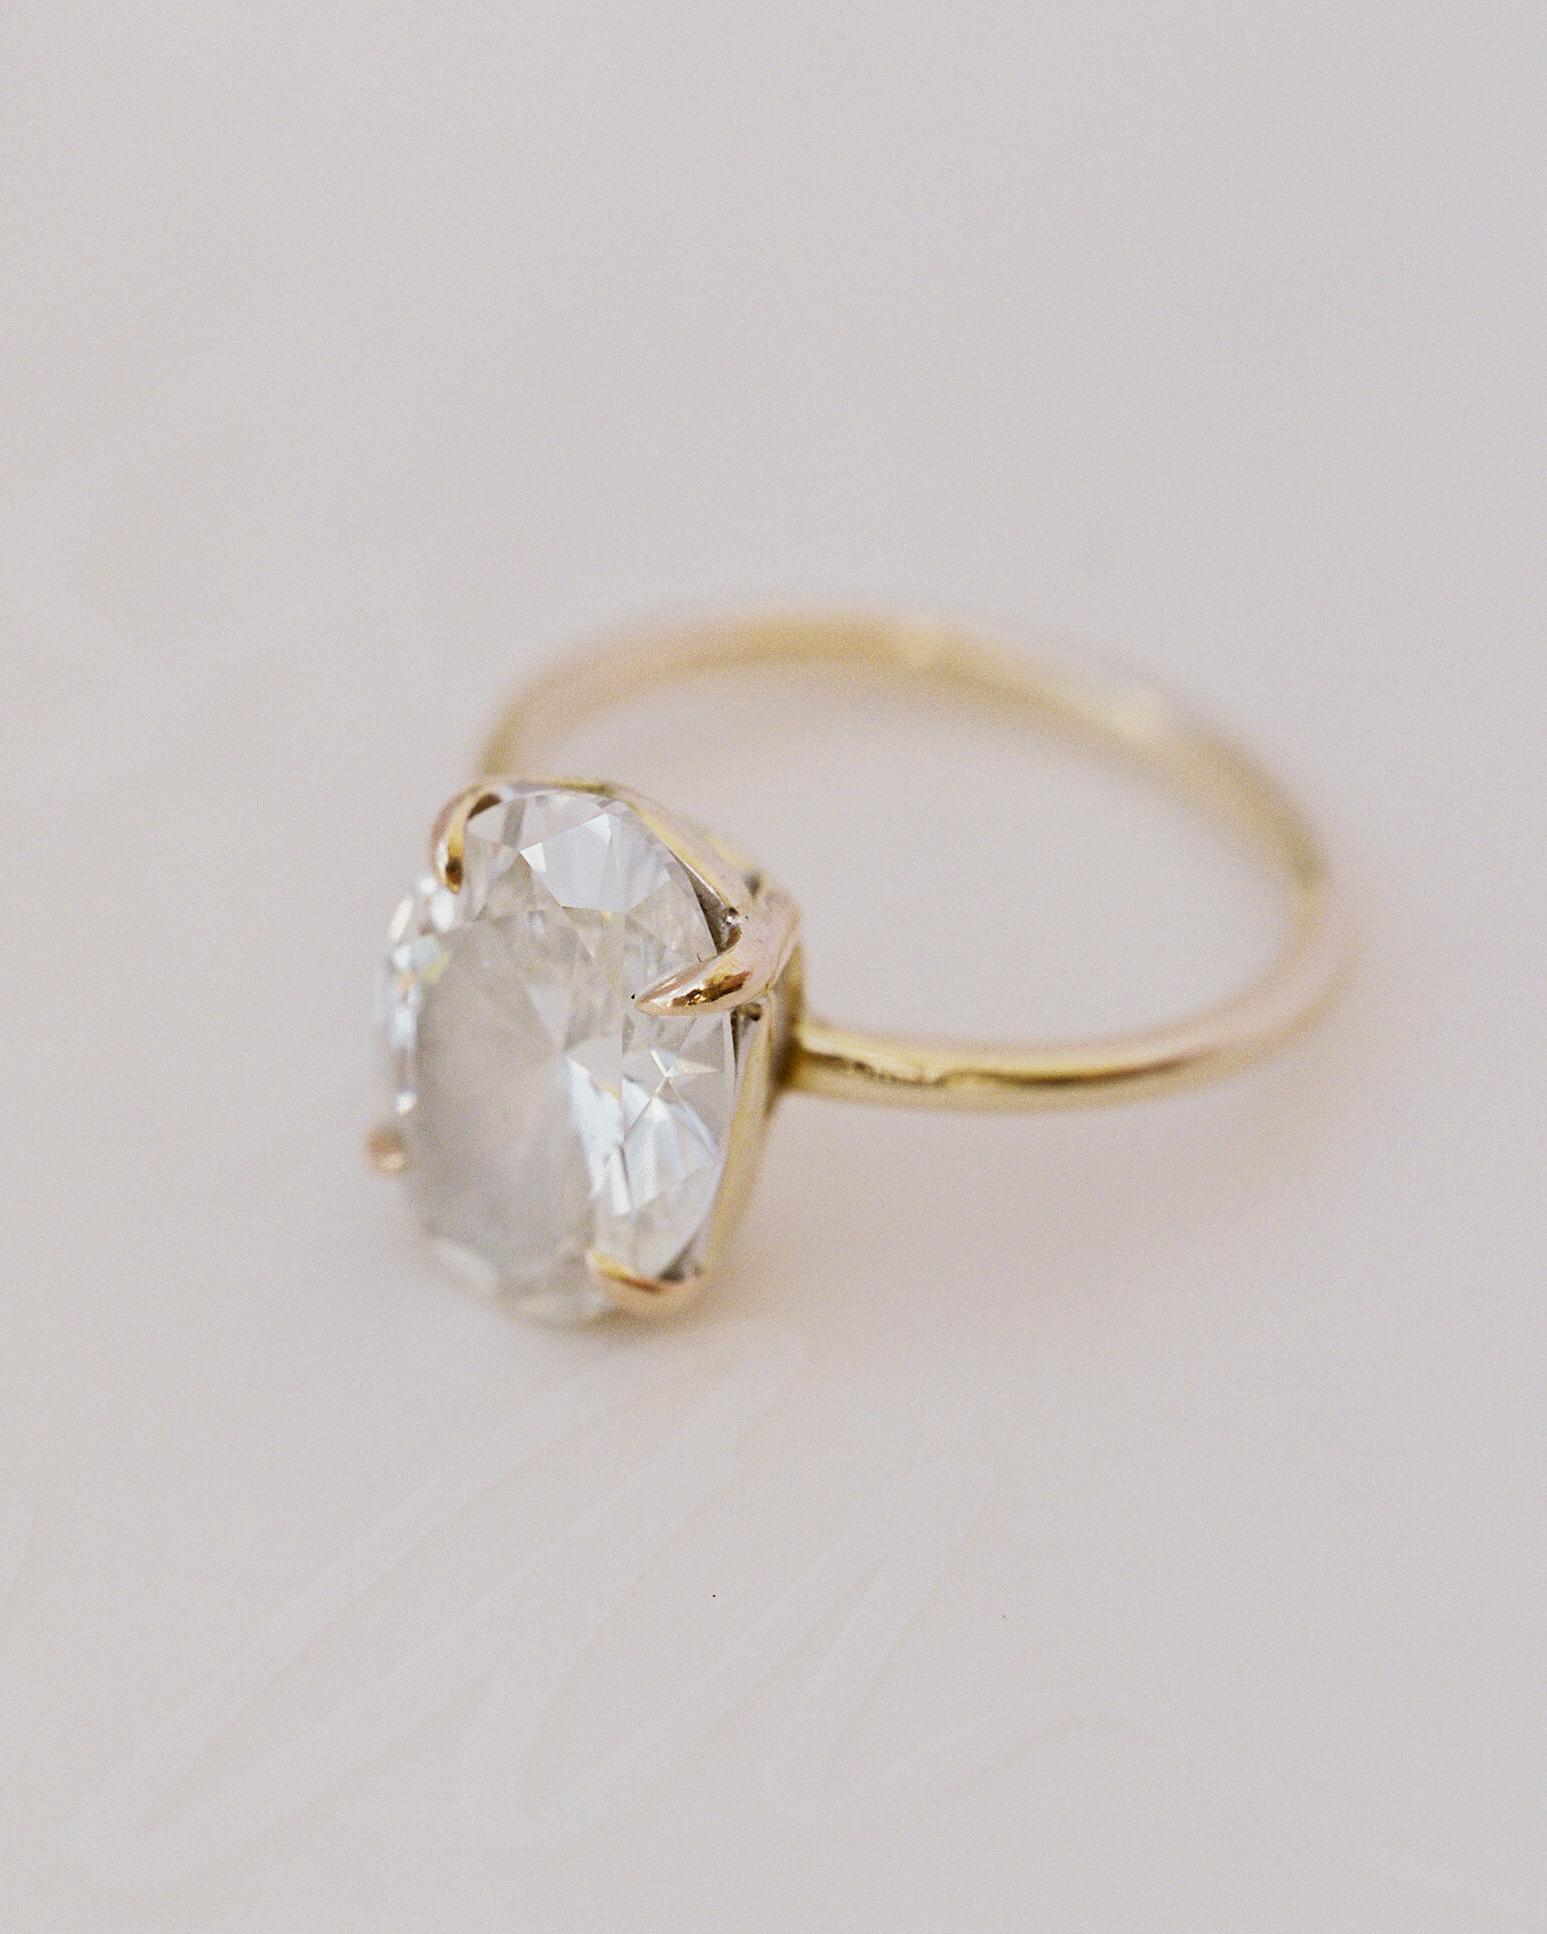 jessica ryan wedding gold engagement ring